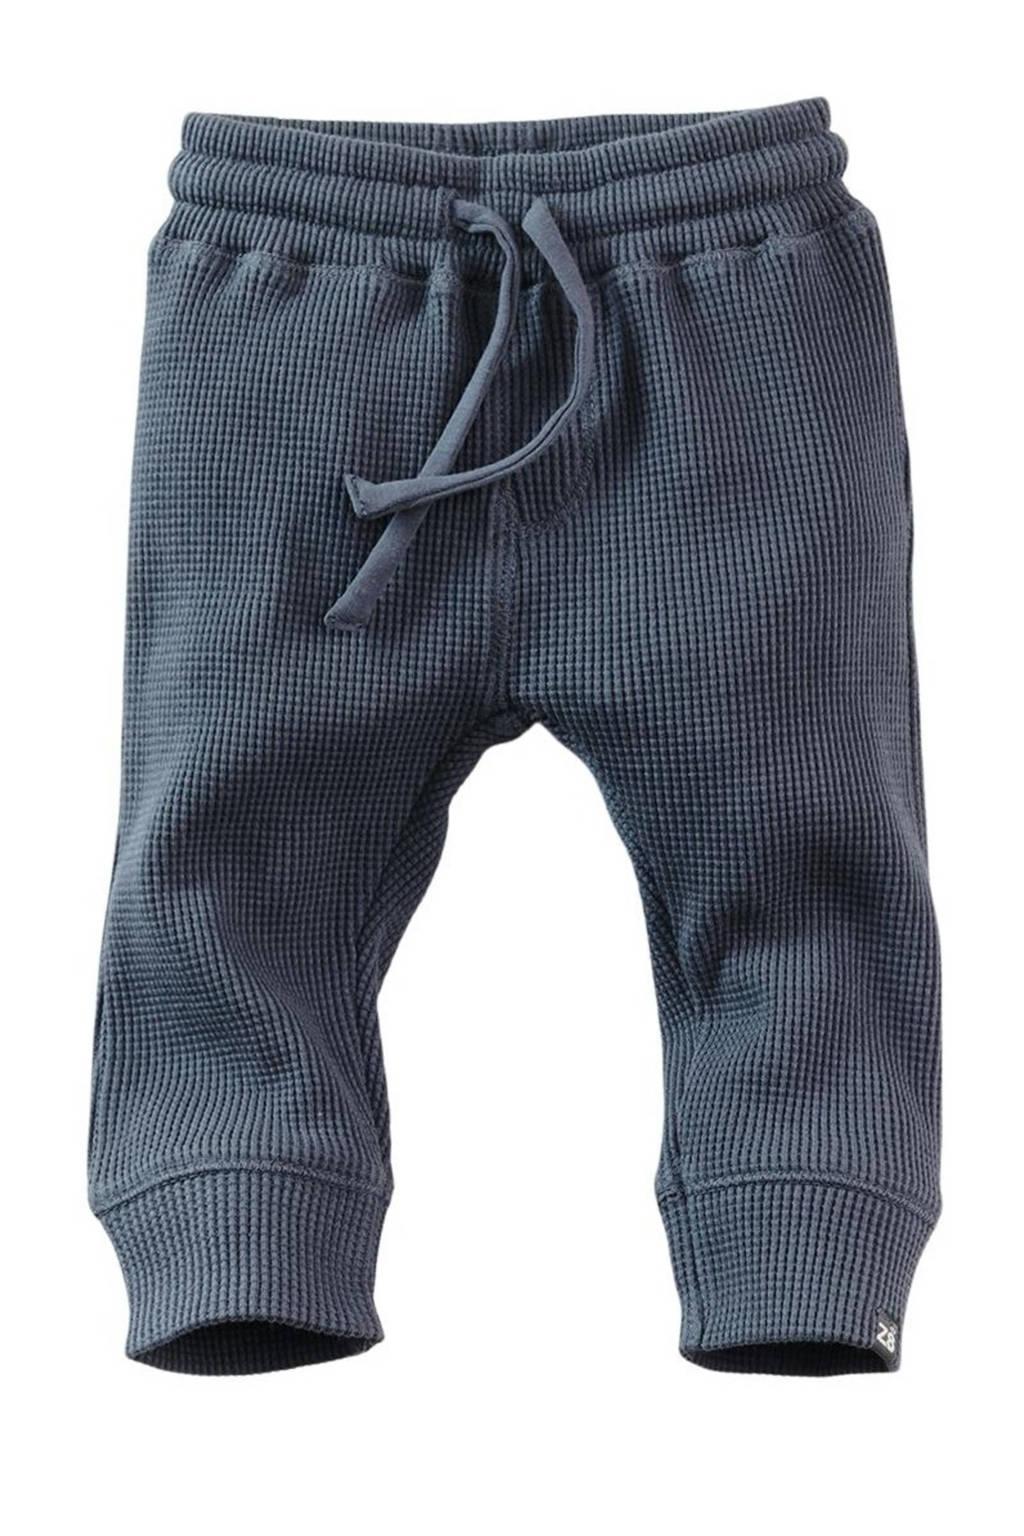 Z8 baby joggingbroek Dominic donkerblauw, Donkerblauw